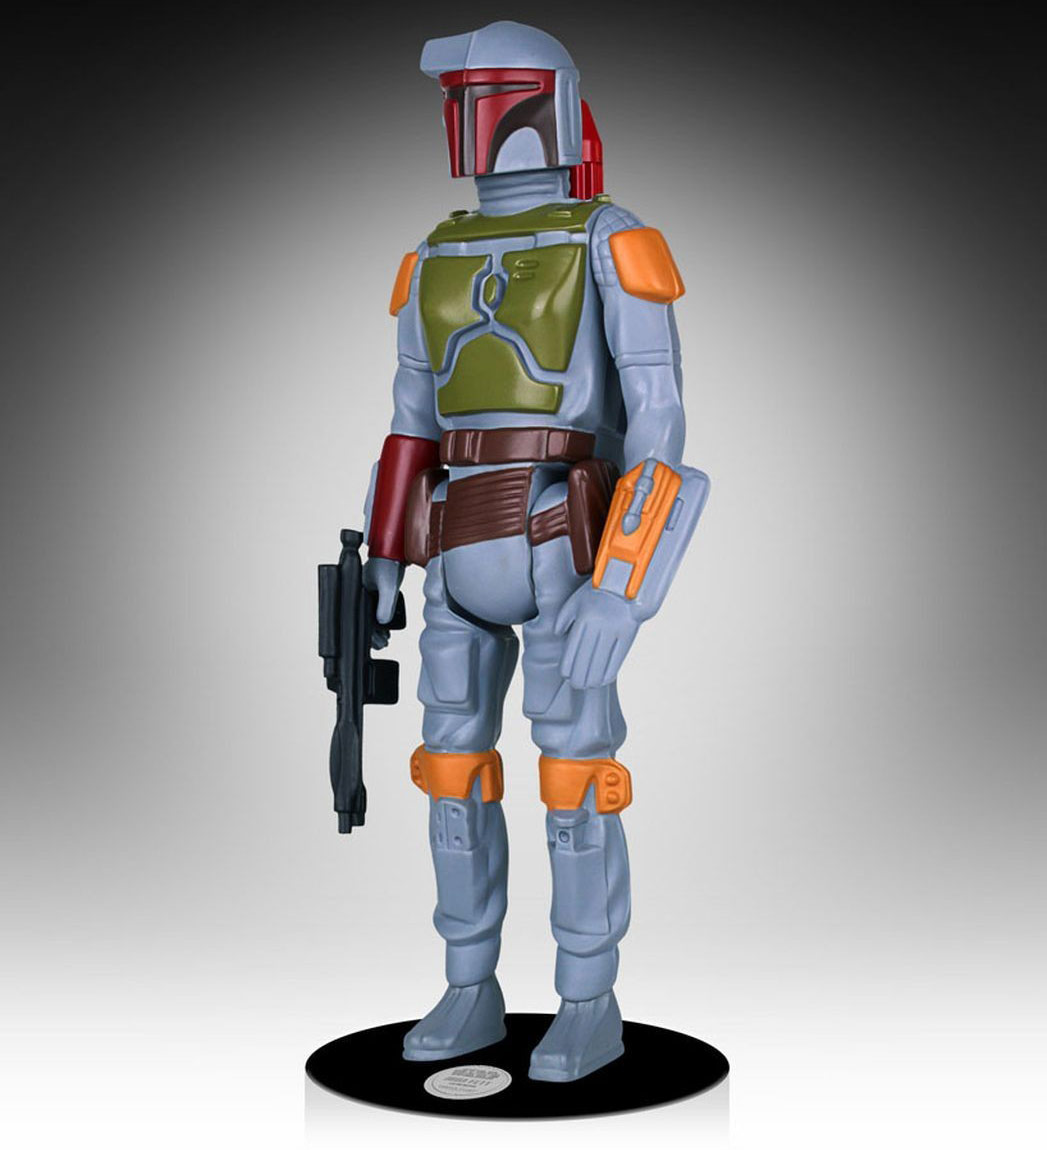 Star Wars Boba Fett Life Size Kenner Action Figure